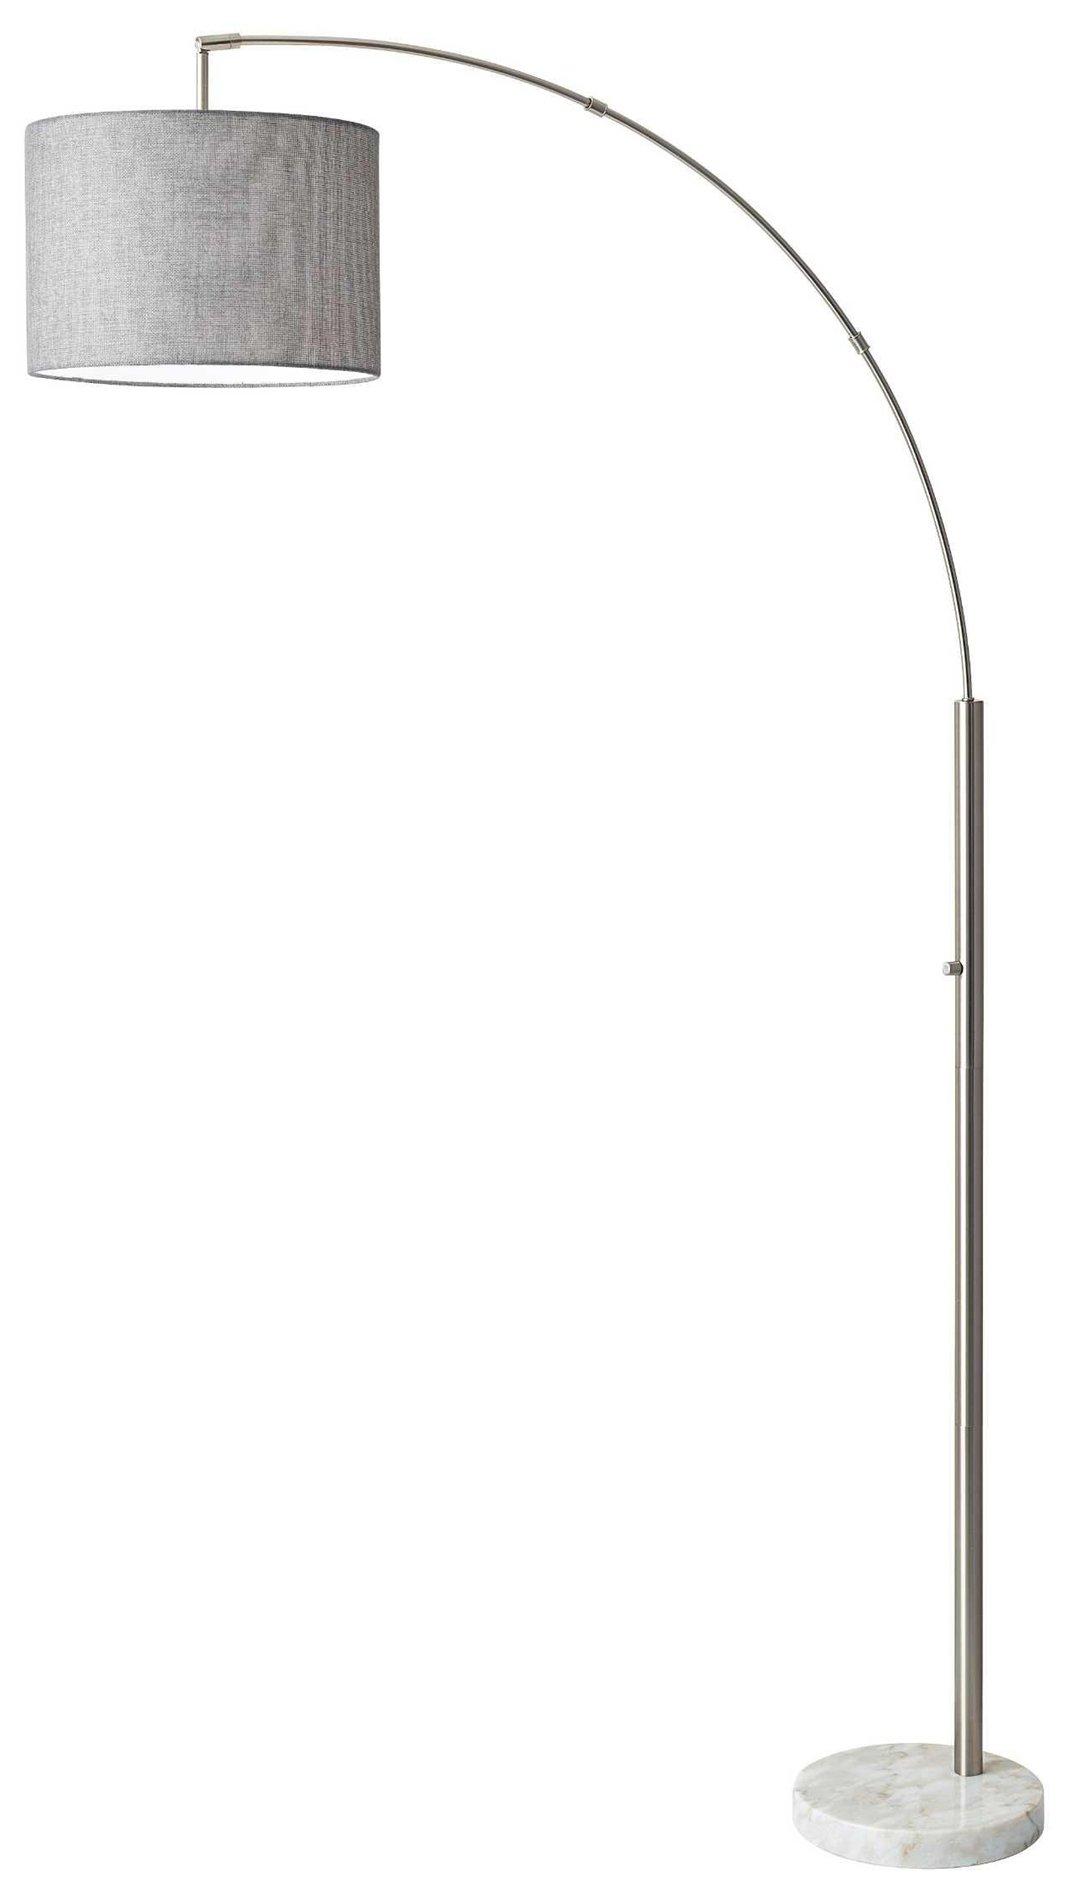 Adesso 4249-22 Bowery Modern / Contemporary Arc Floor Lamp AD-4249-22